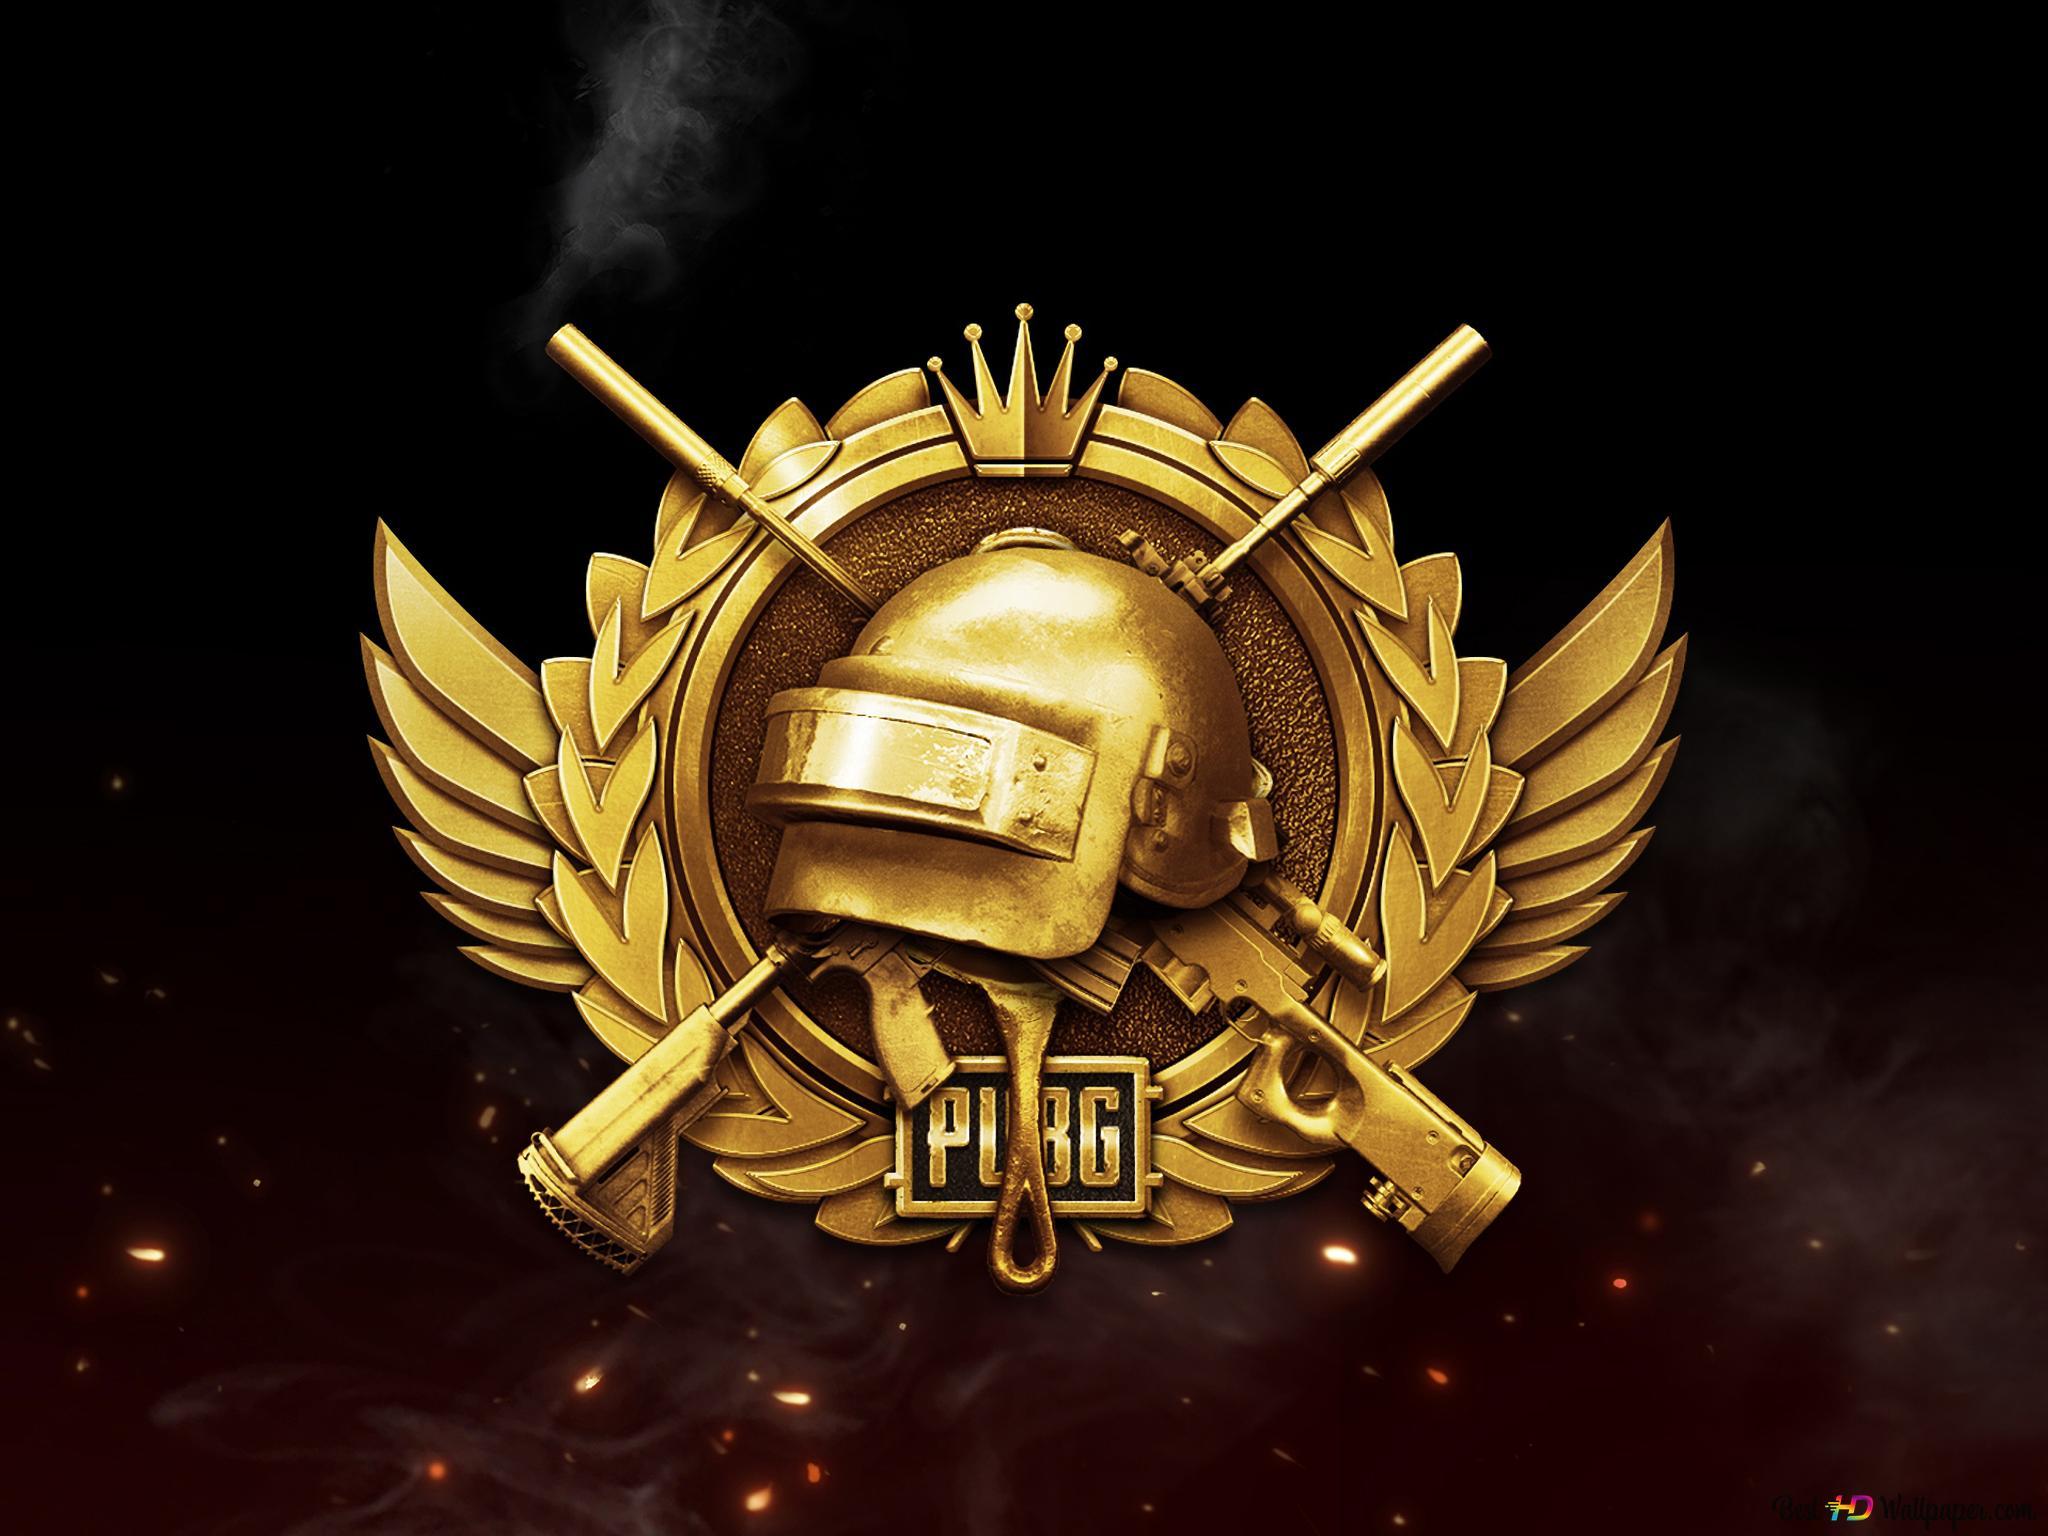 Playerunknown S Battlegrounds Pubg Mobile Golden Badge Logo Hd